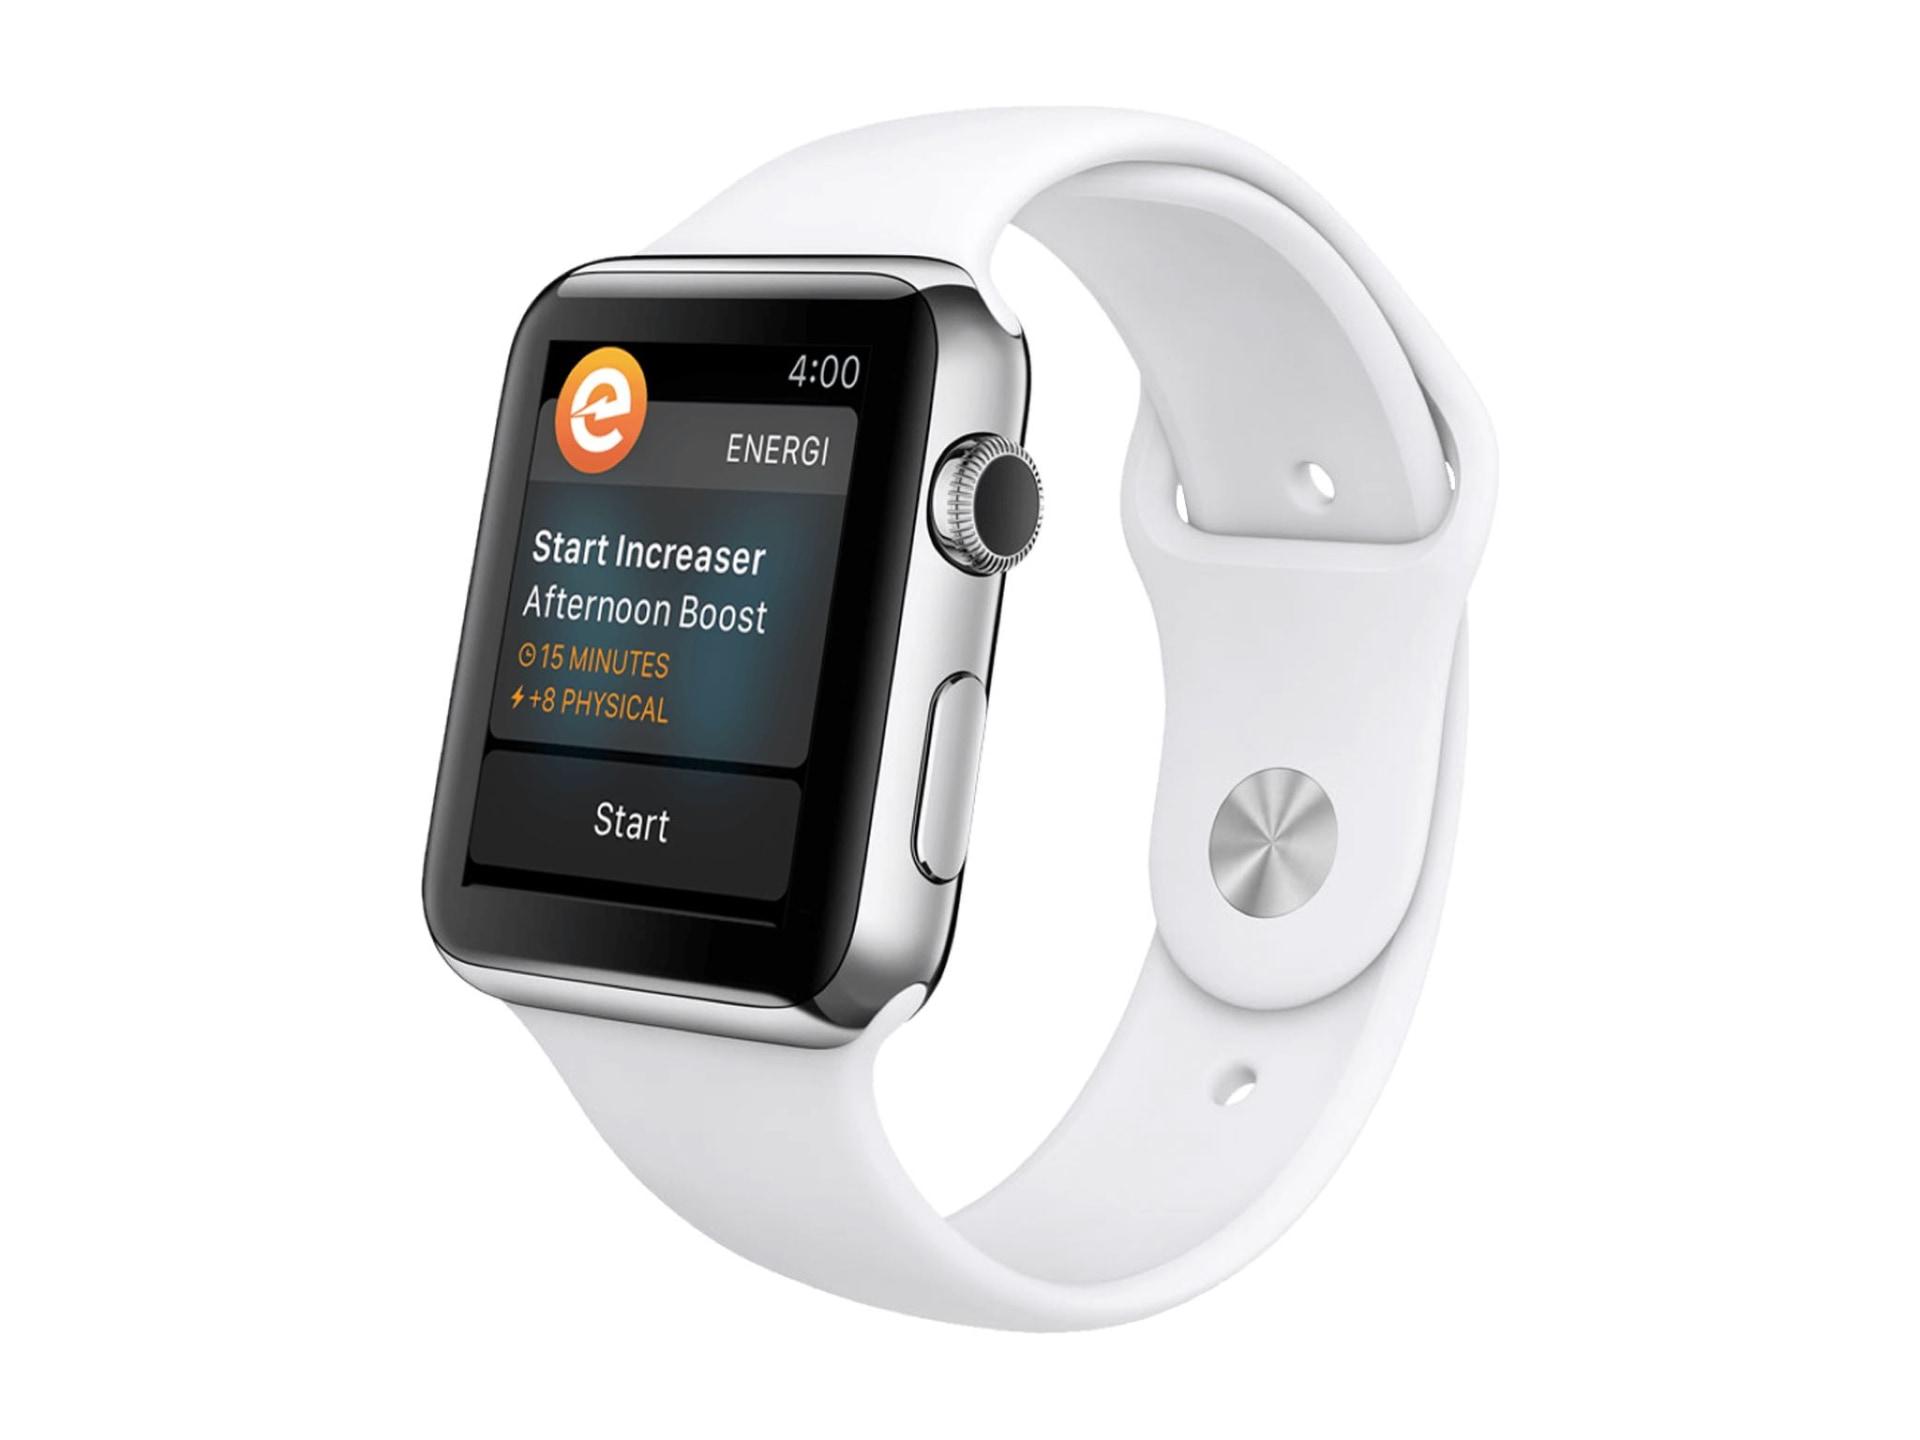 Energi-App-on-AppleWatch-Rocksauce-Studios